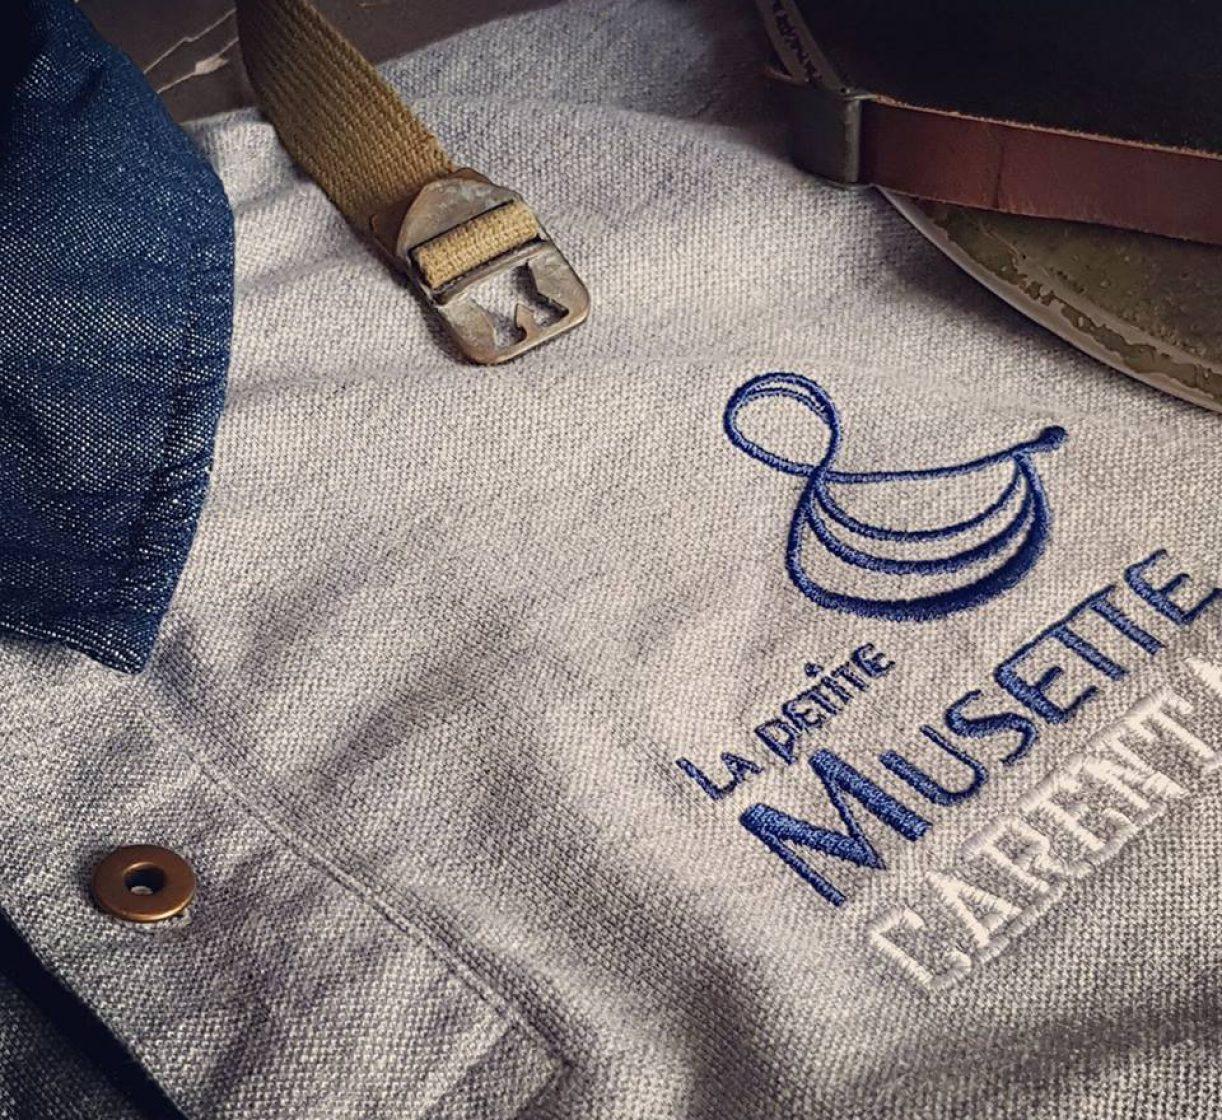 boutique militaria surplus petite musette carentan dday baie cotentin